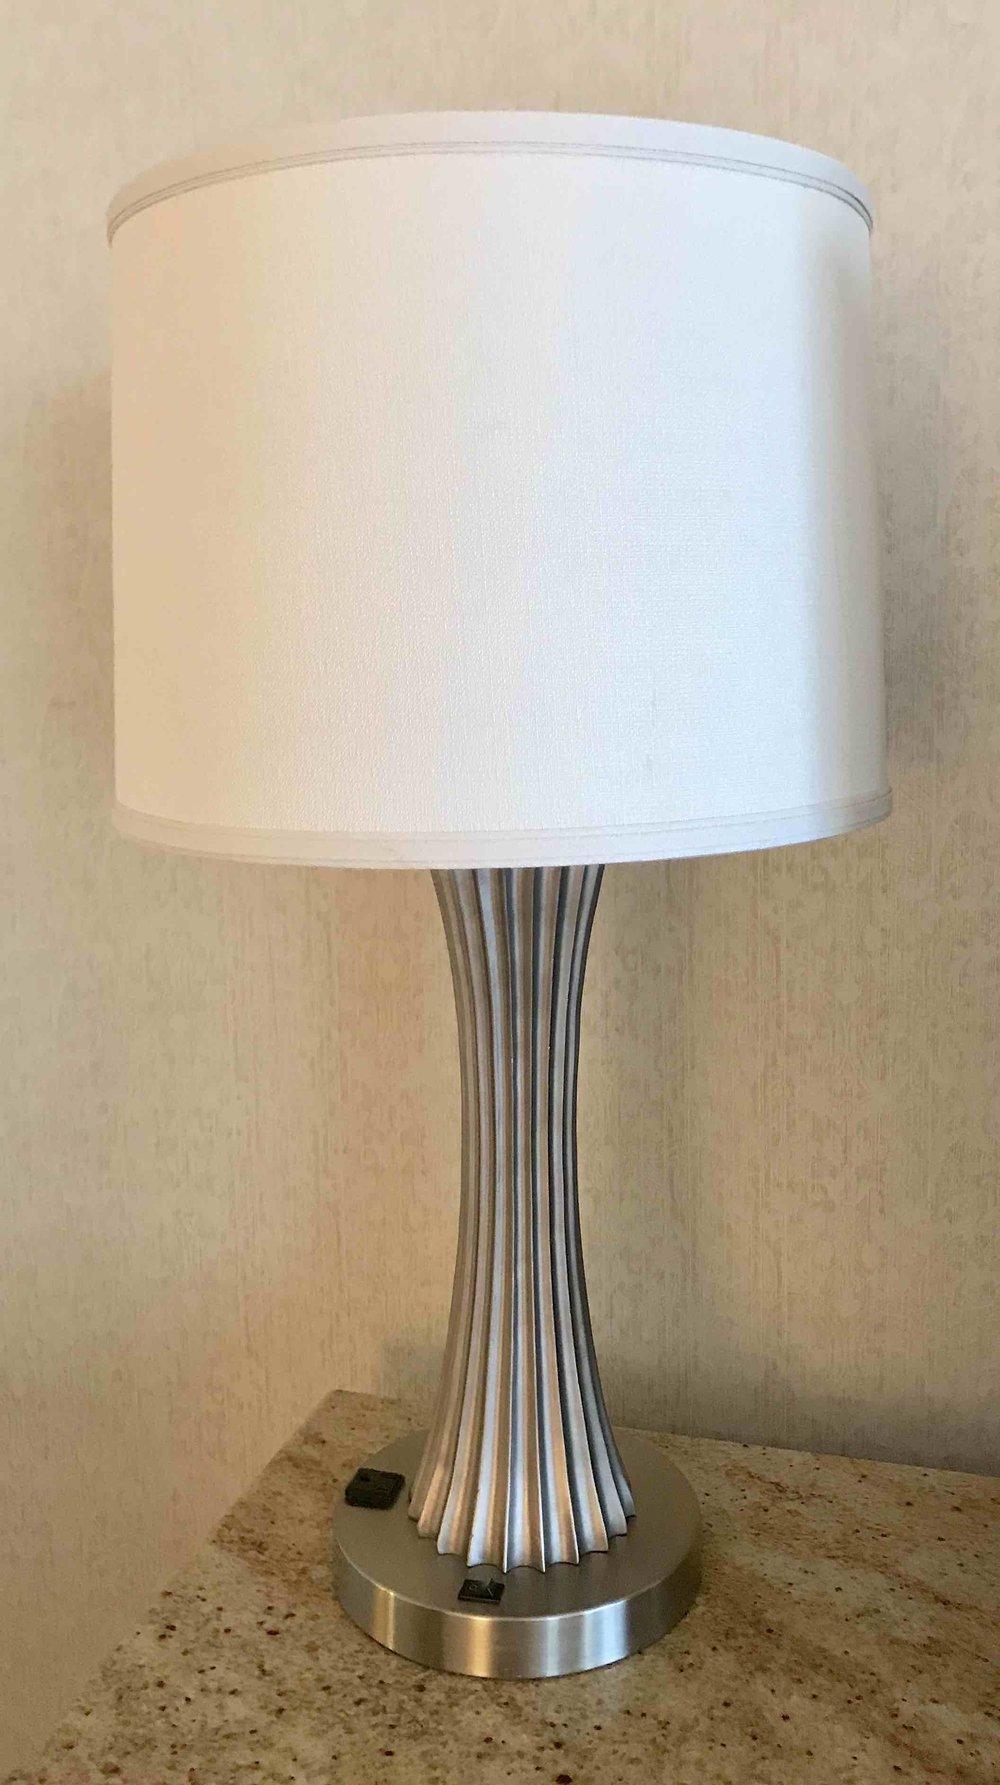 JW Fluted Lamp $25